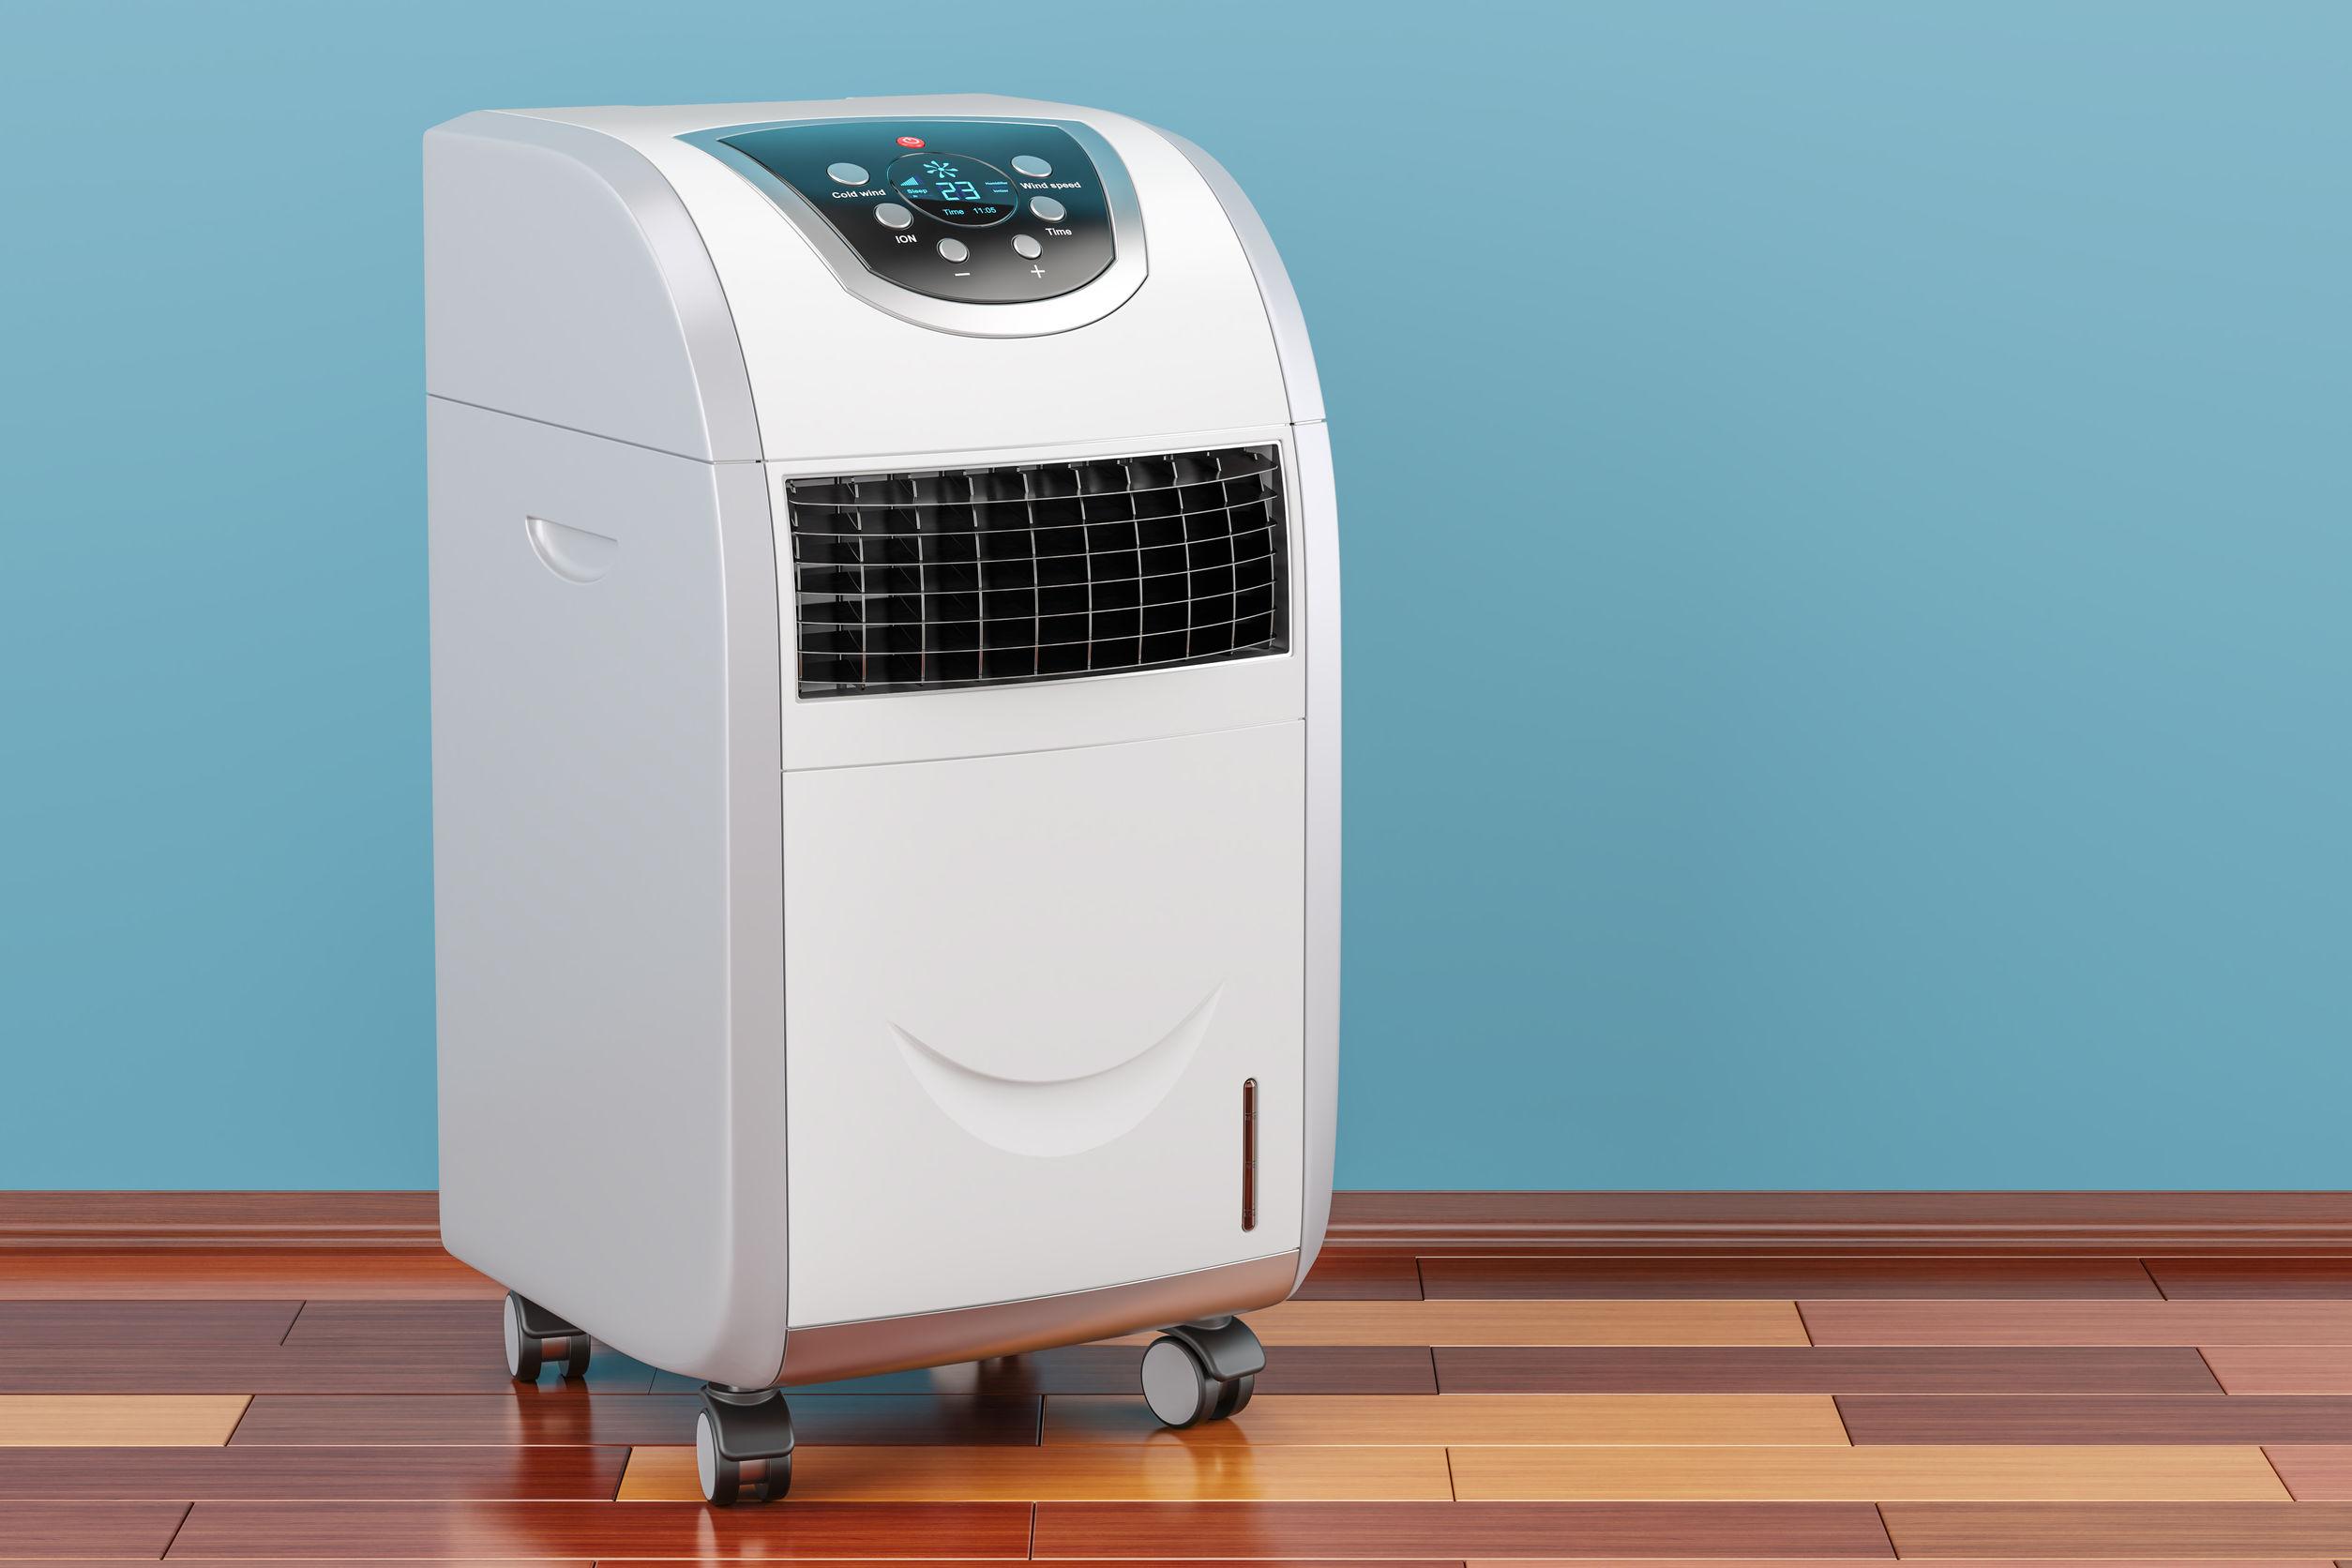 Climatizador portátil: ¿Cuál es el mejor del 2020?